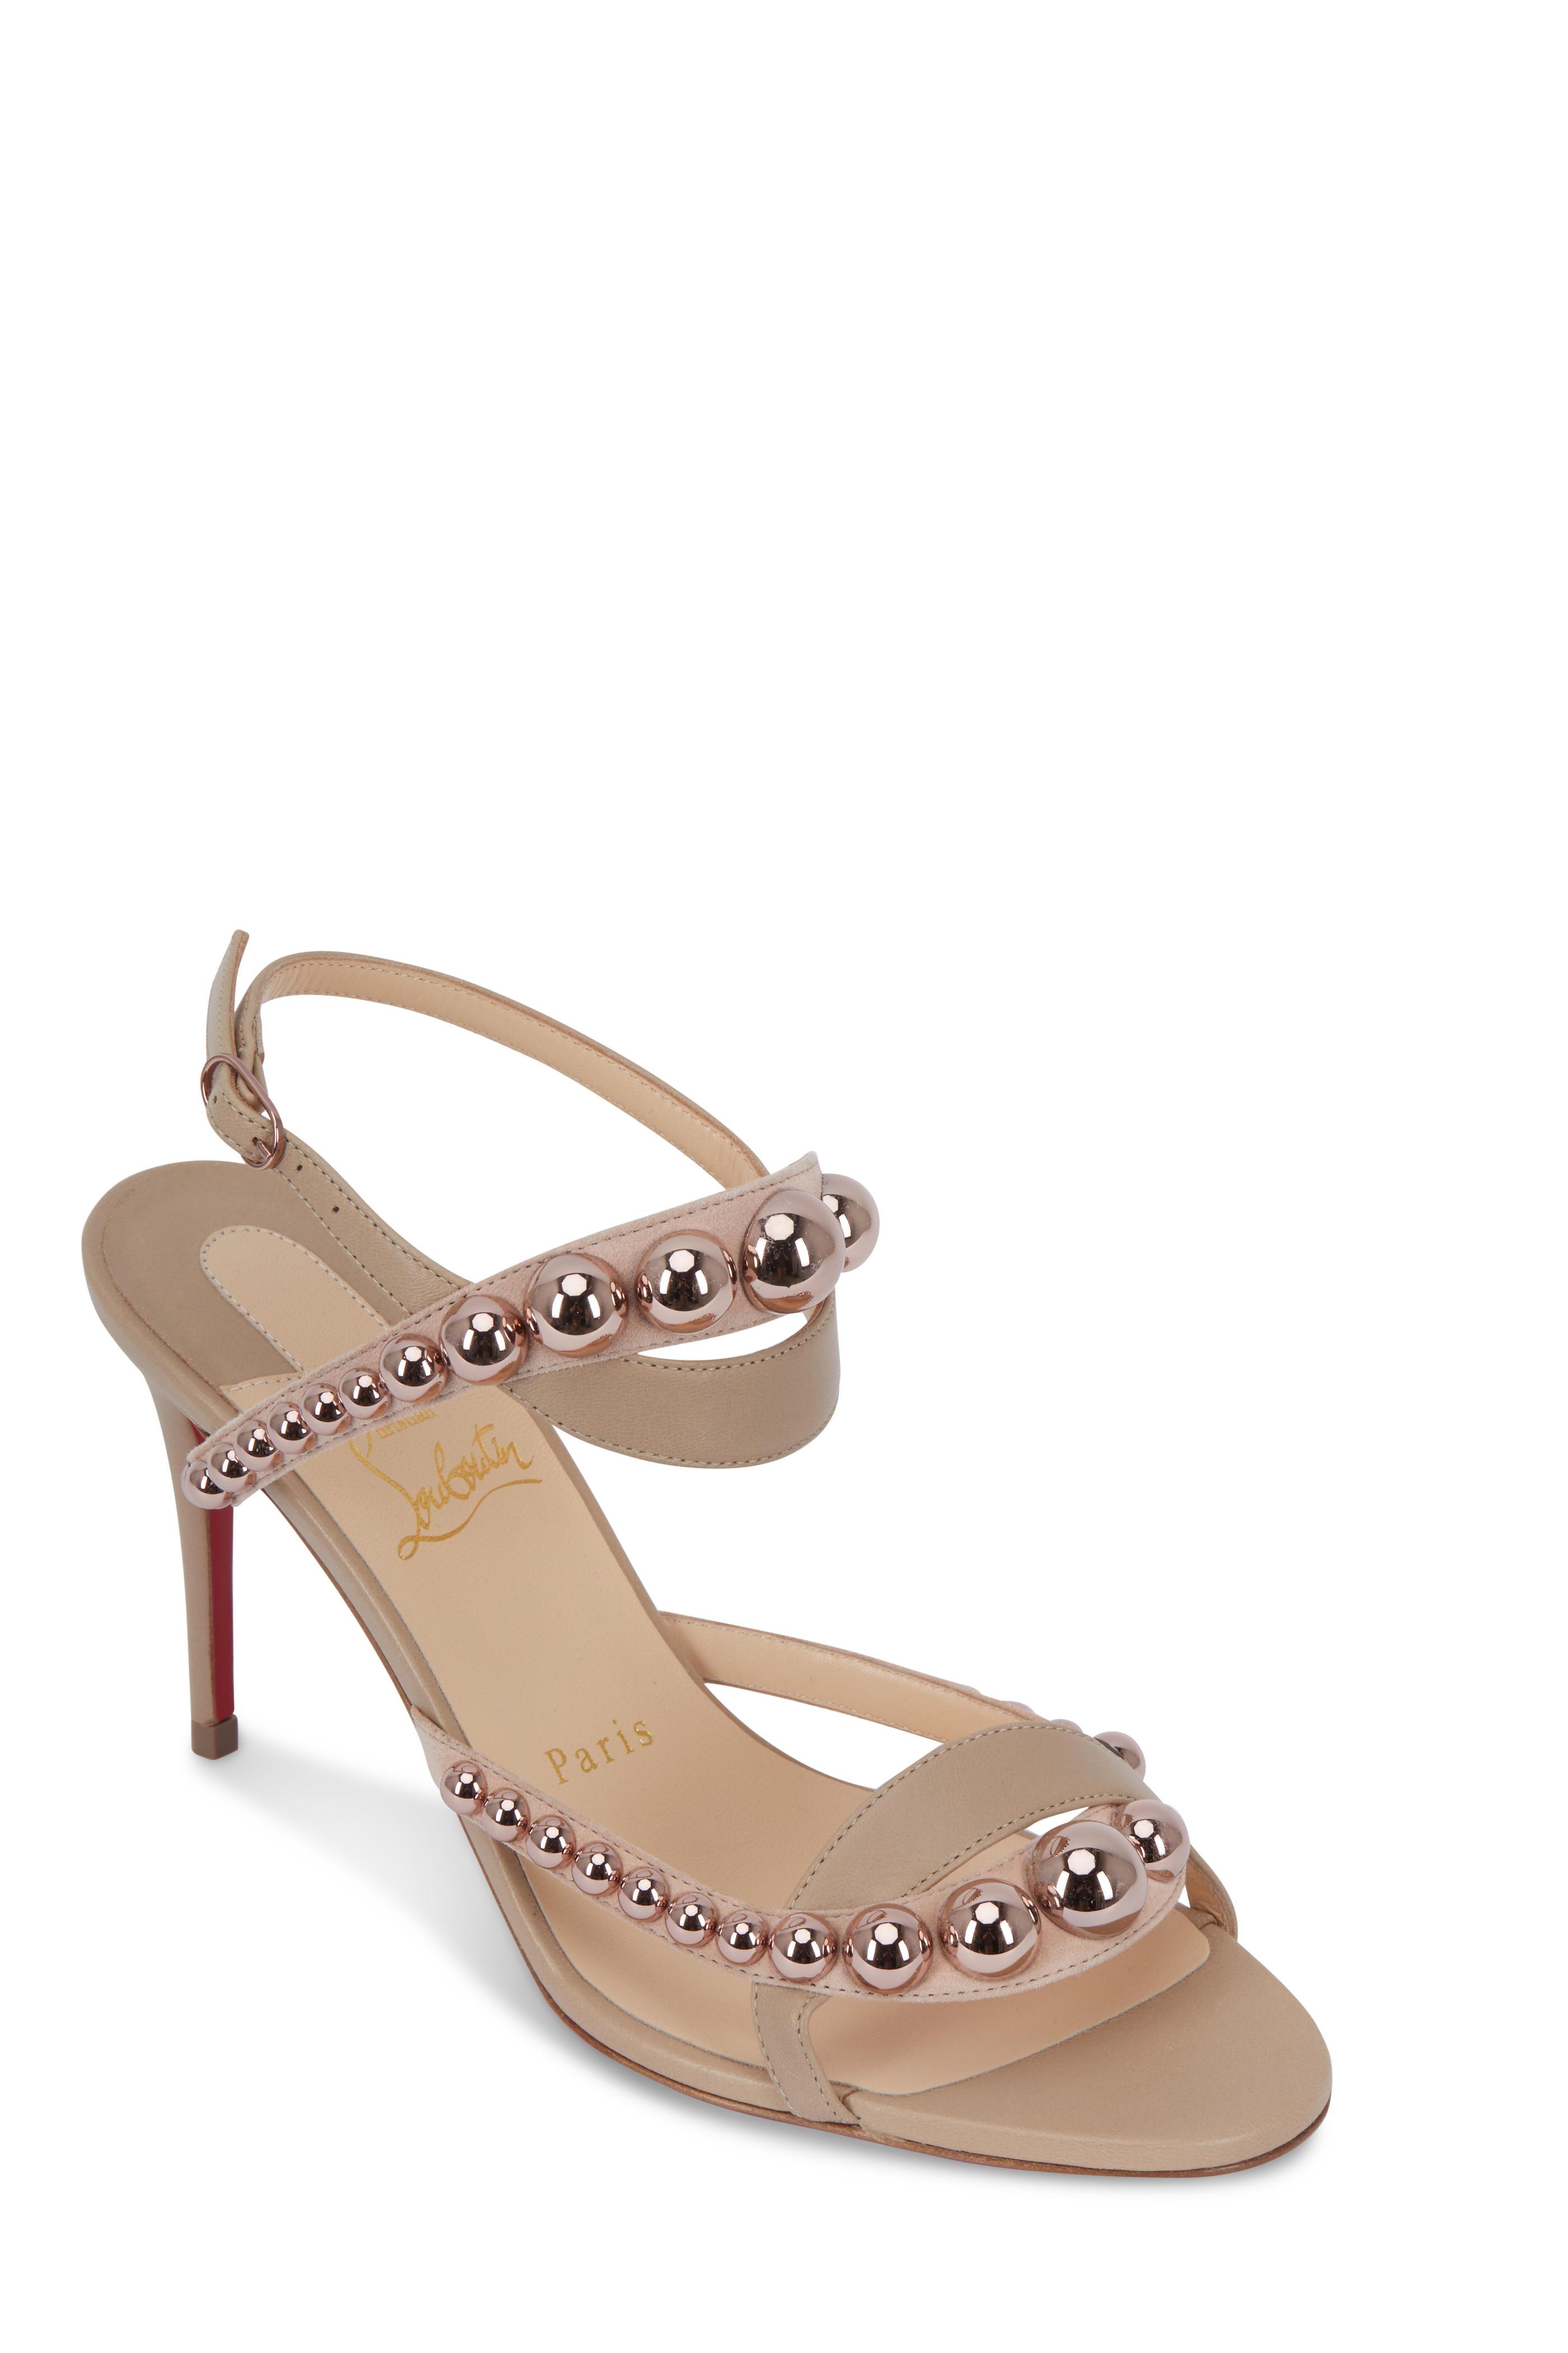 sale retailer 4b34c 66428 Christian Louboutin - Galeria Nude & Bronze Rose Stud Sandal ...